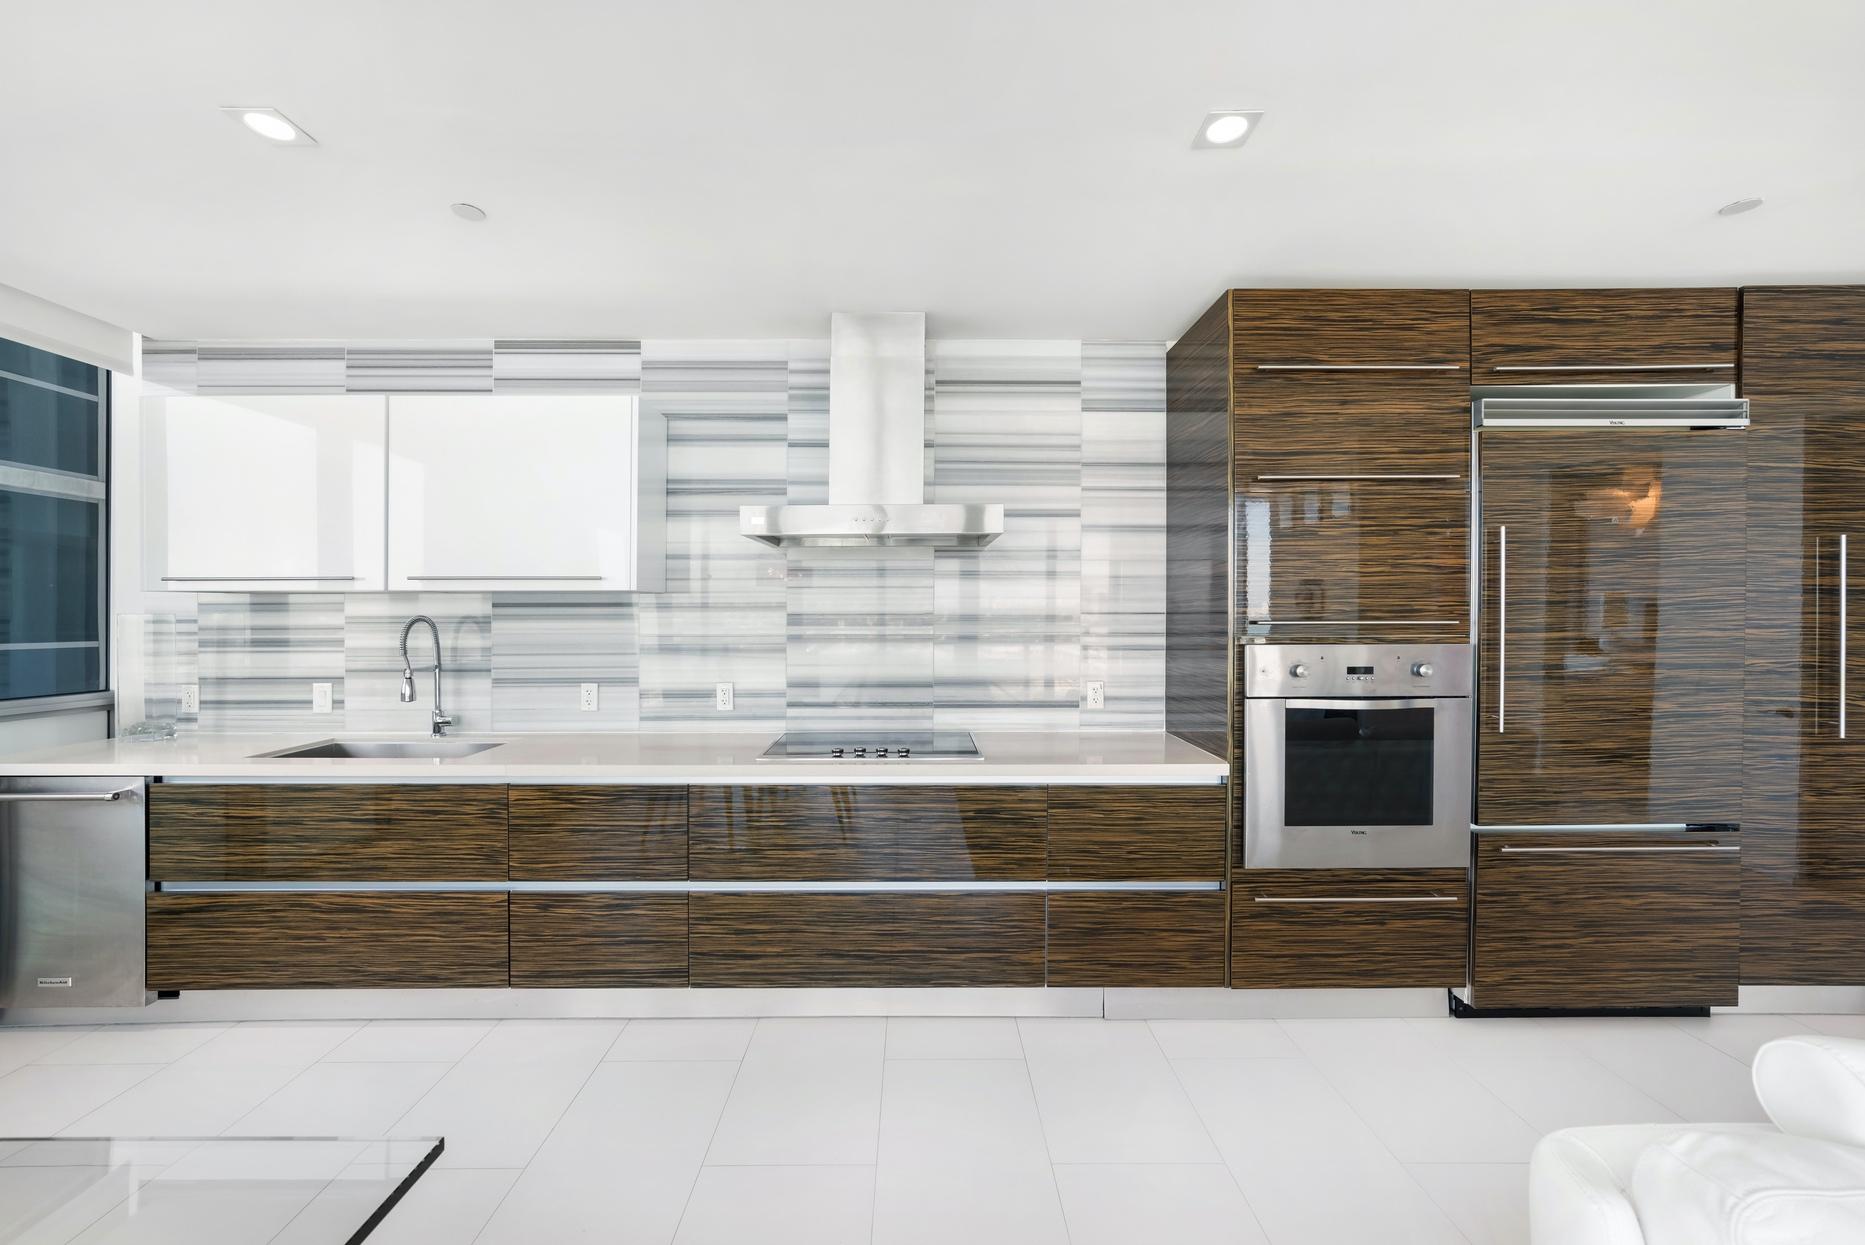 kitchen with Viking appliances